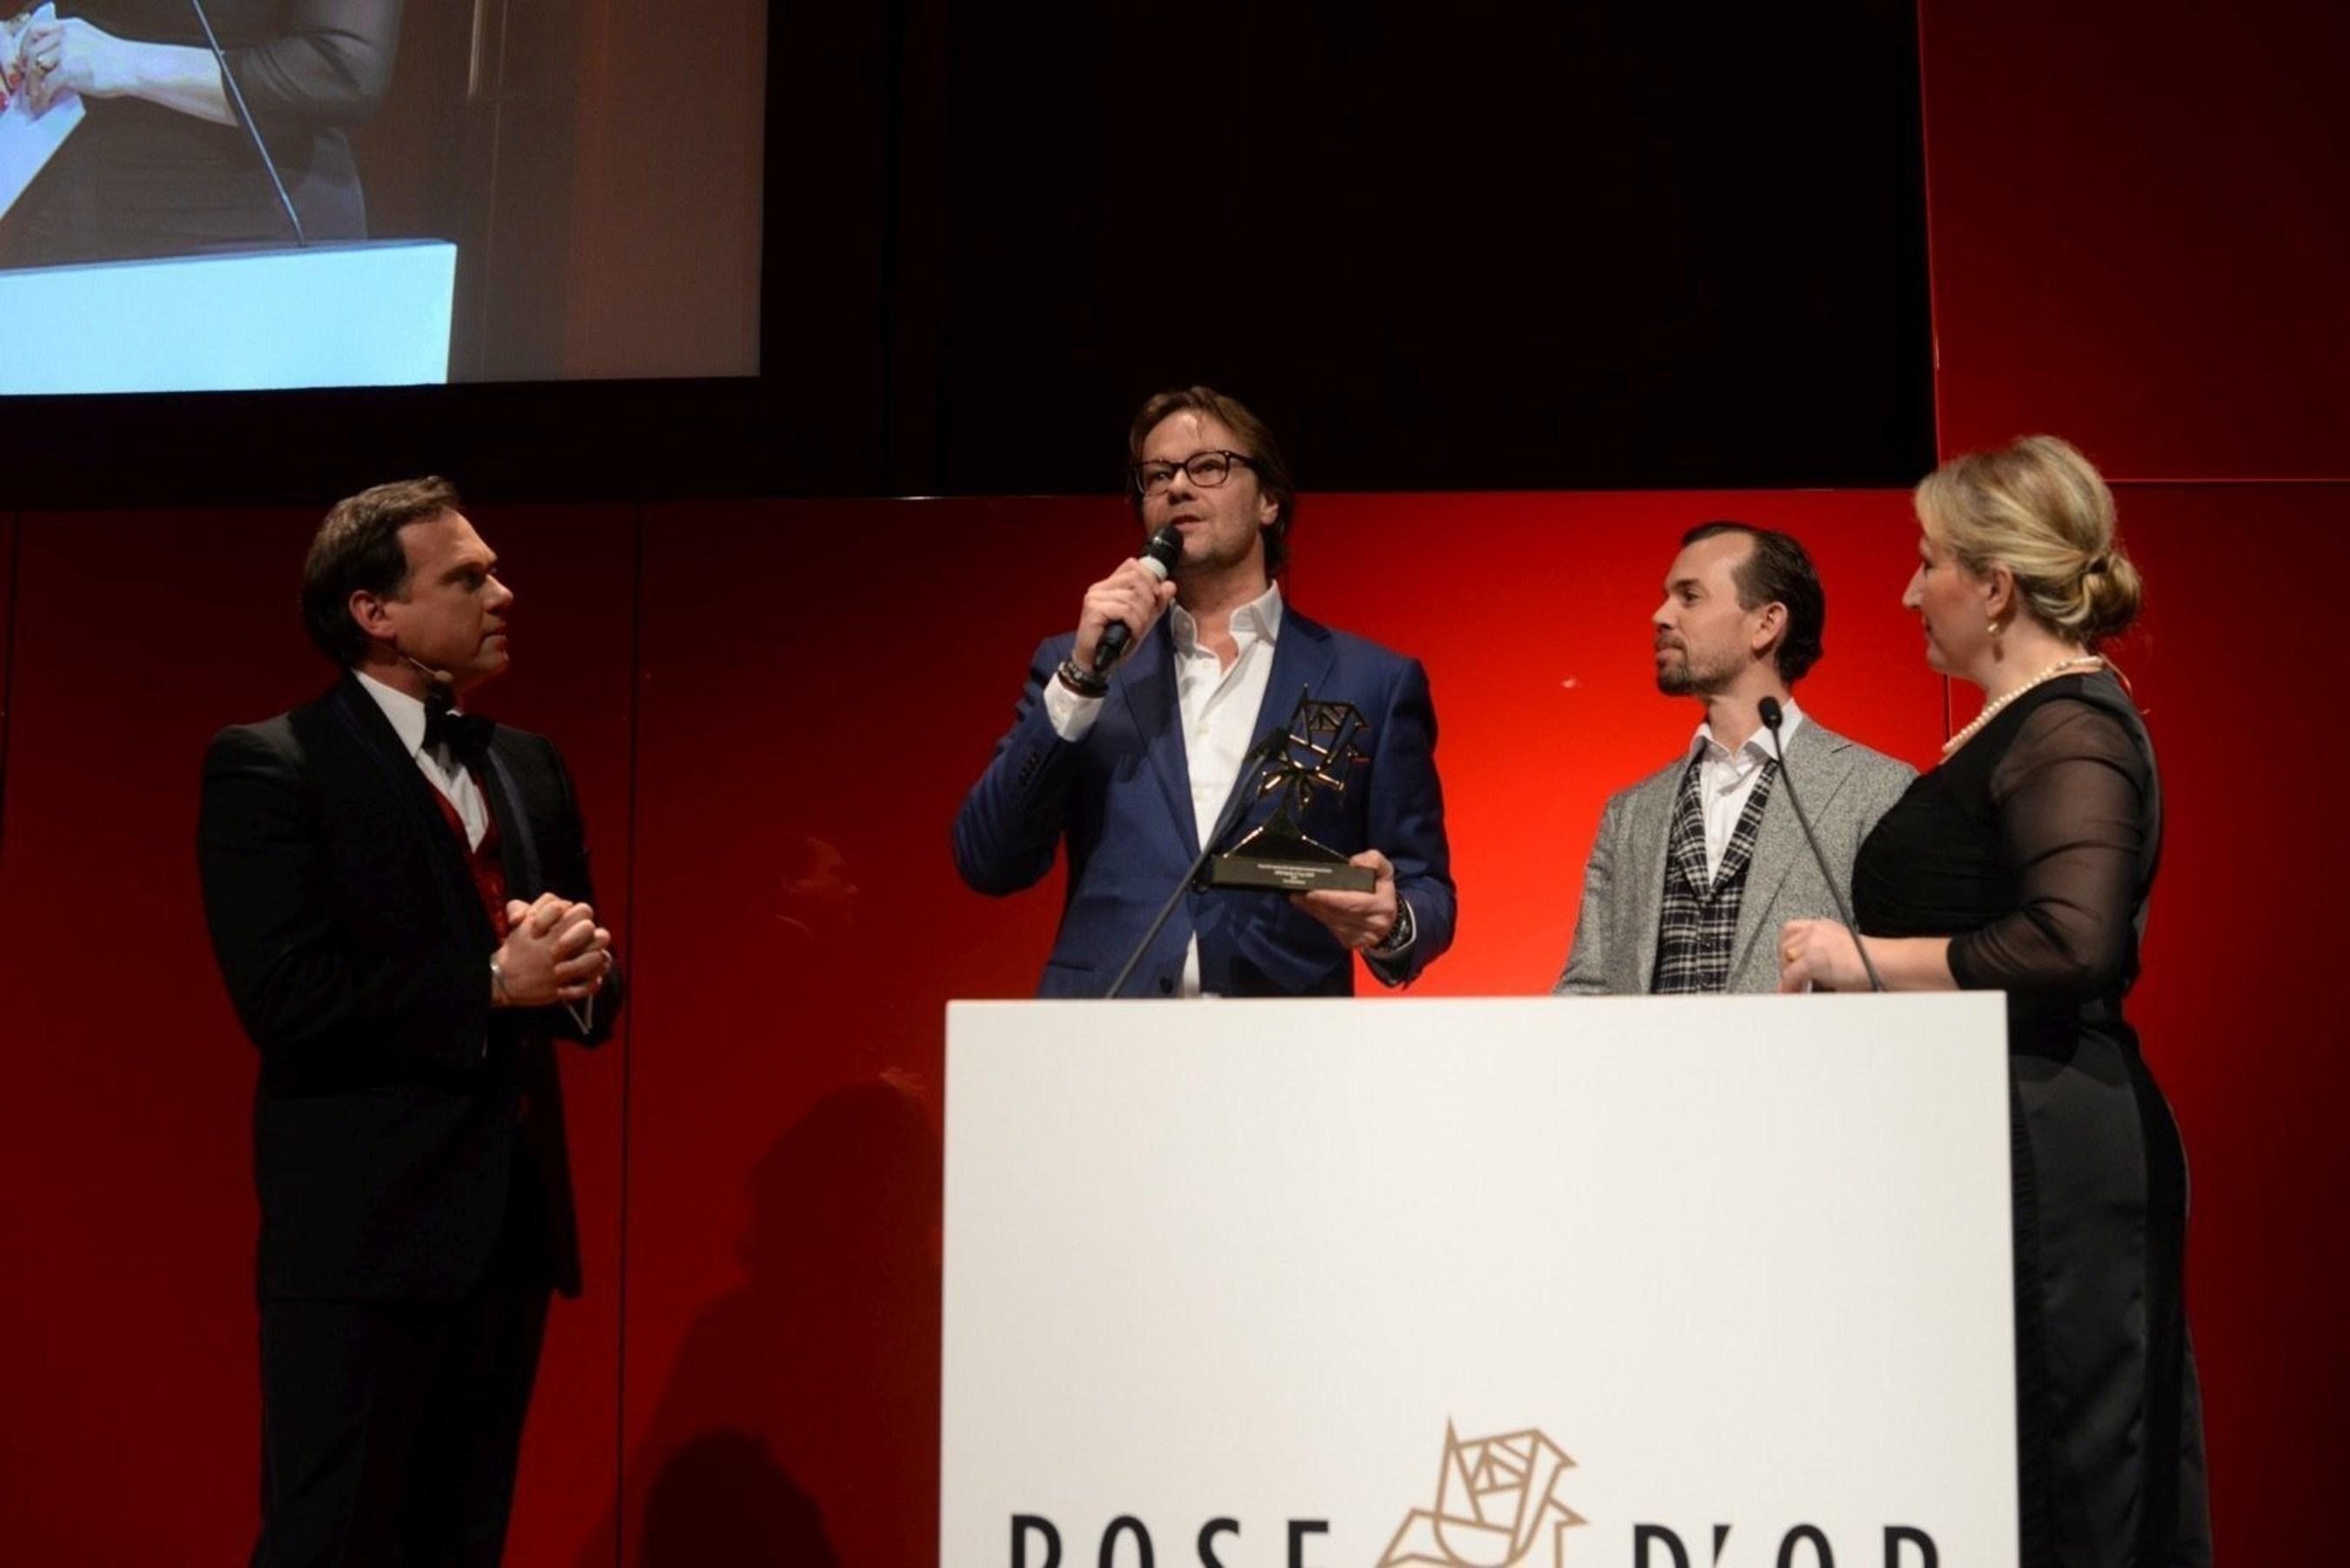 NPO Netherlands wins Rose d'Or for Radio Entertainment Event - NPO Radio 2 Top 2000 (PRNewsFoto/European Broadcasting Union) (PRNewsFoto/European Broadcasting Union)